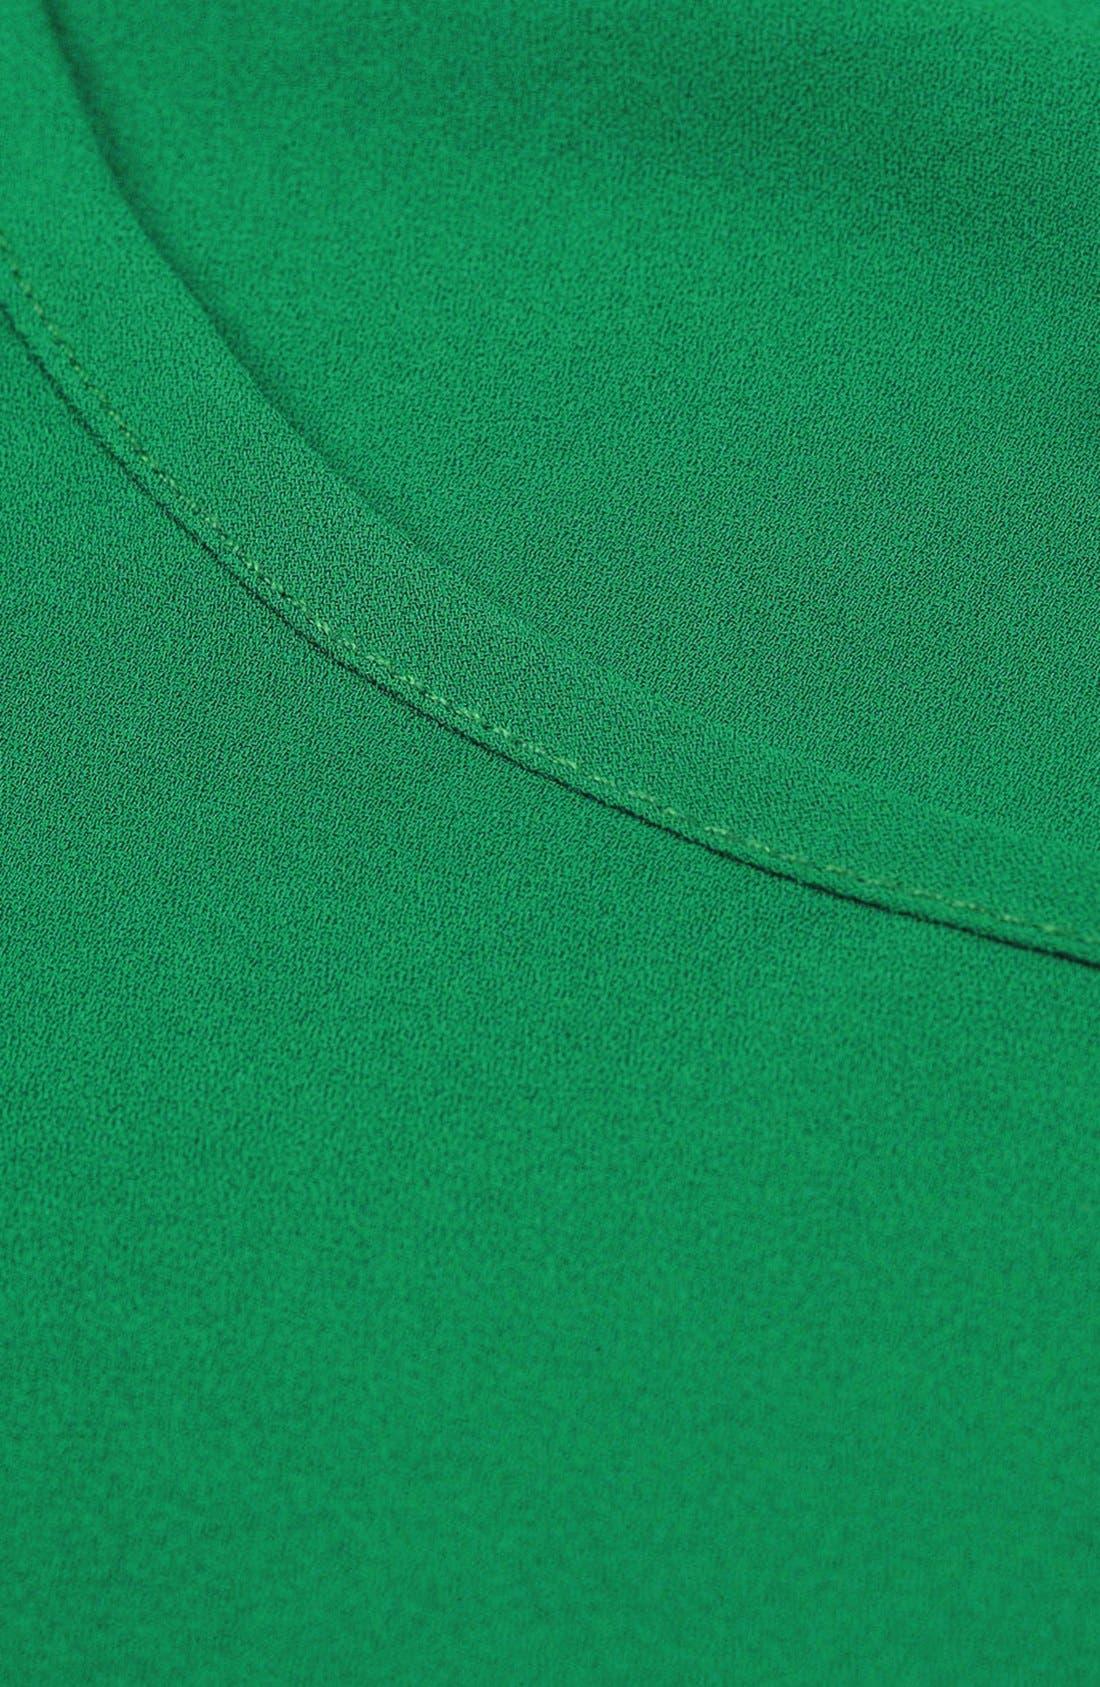 Alternate Image 3  - Topshop 'Pasha' Crop Camisole